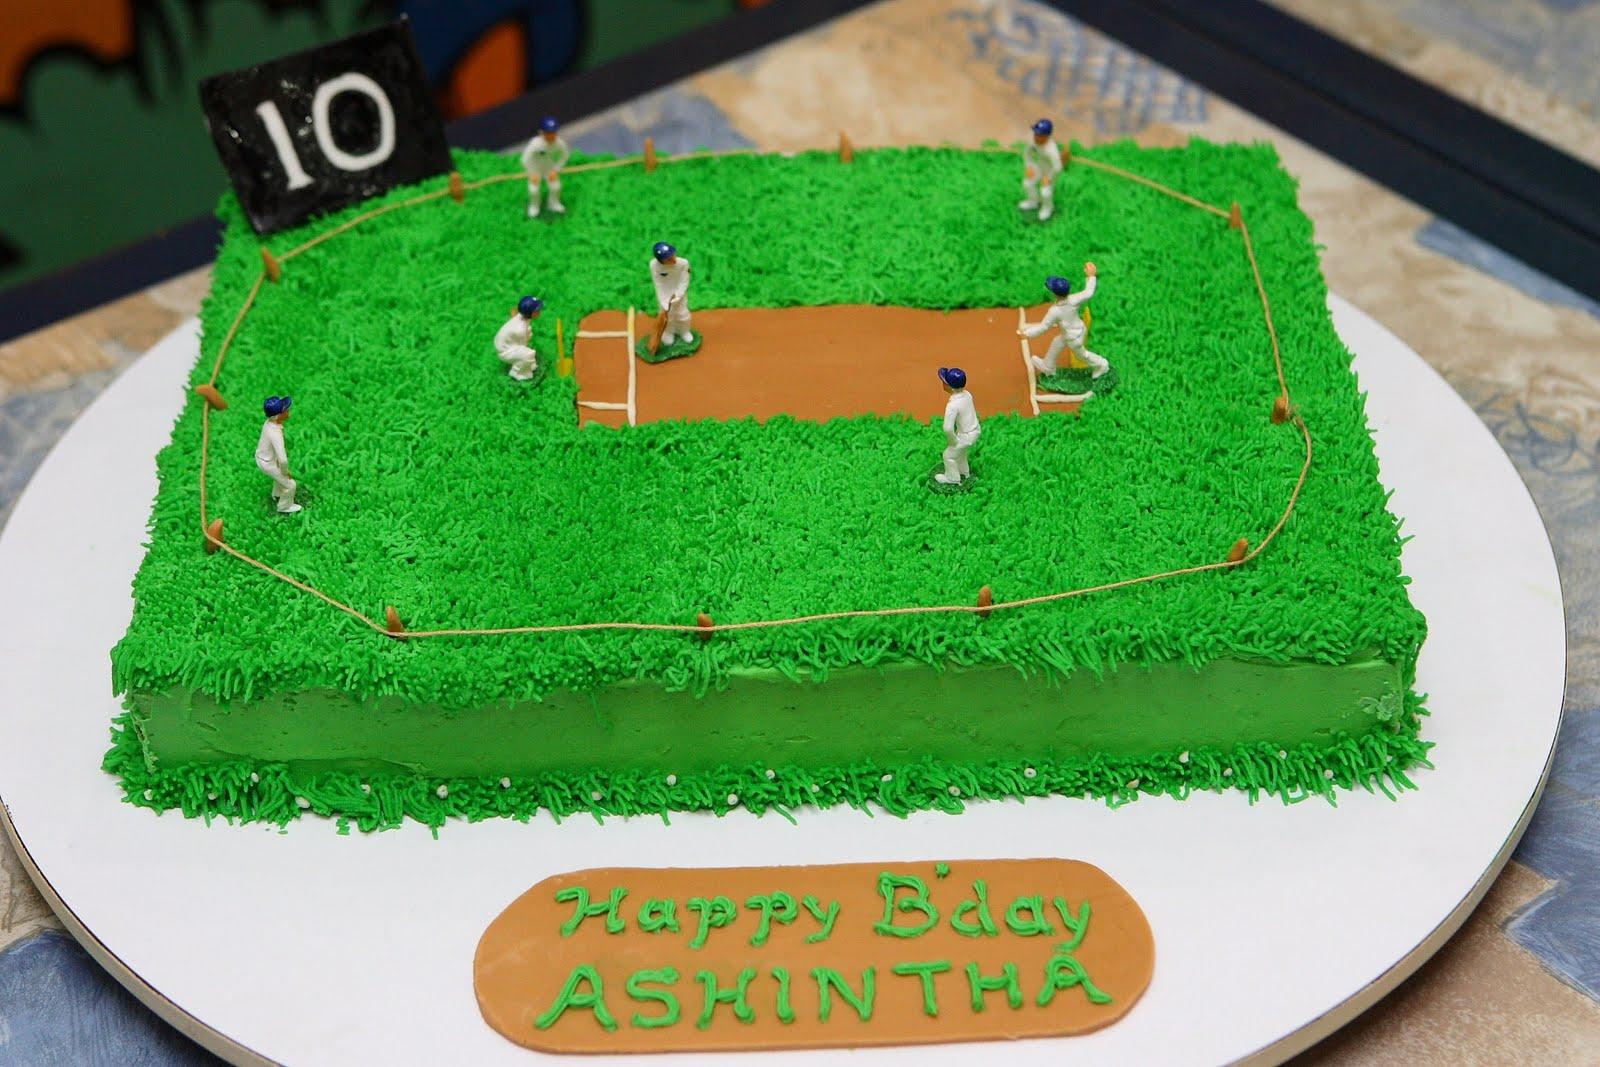 Cricket Birthday Cake Images : Harshi s Cakes & Bakes: Cricket Match